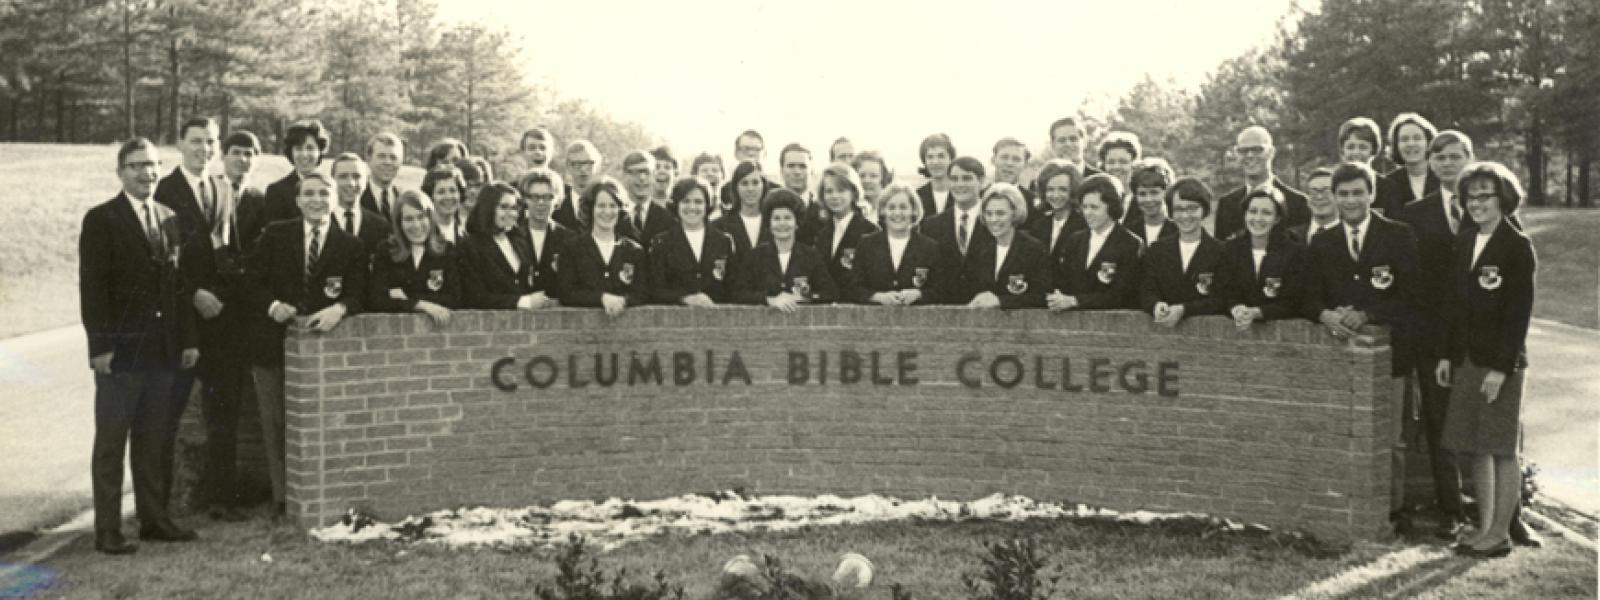 Columbia Bible College Ambassador Choir - late 1960s